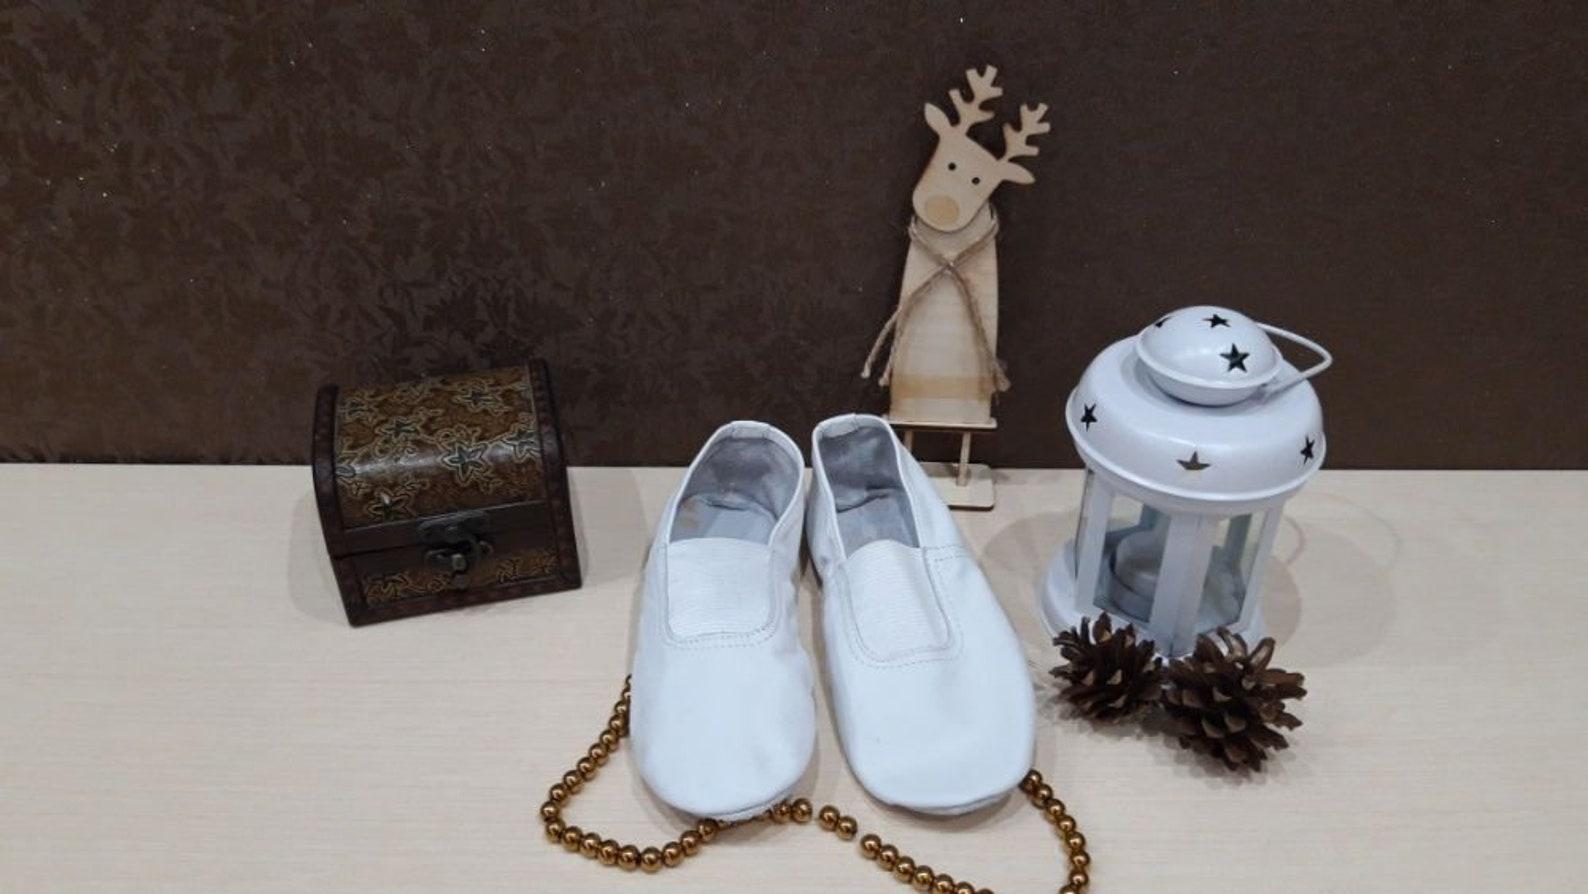 gymnastic shoes / gs / ballet shoes